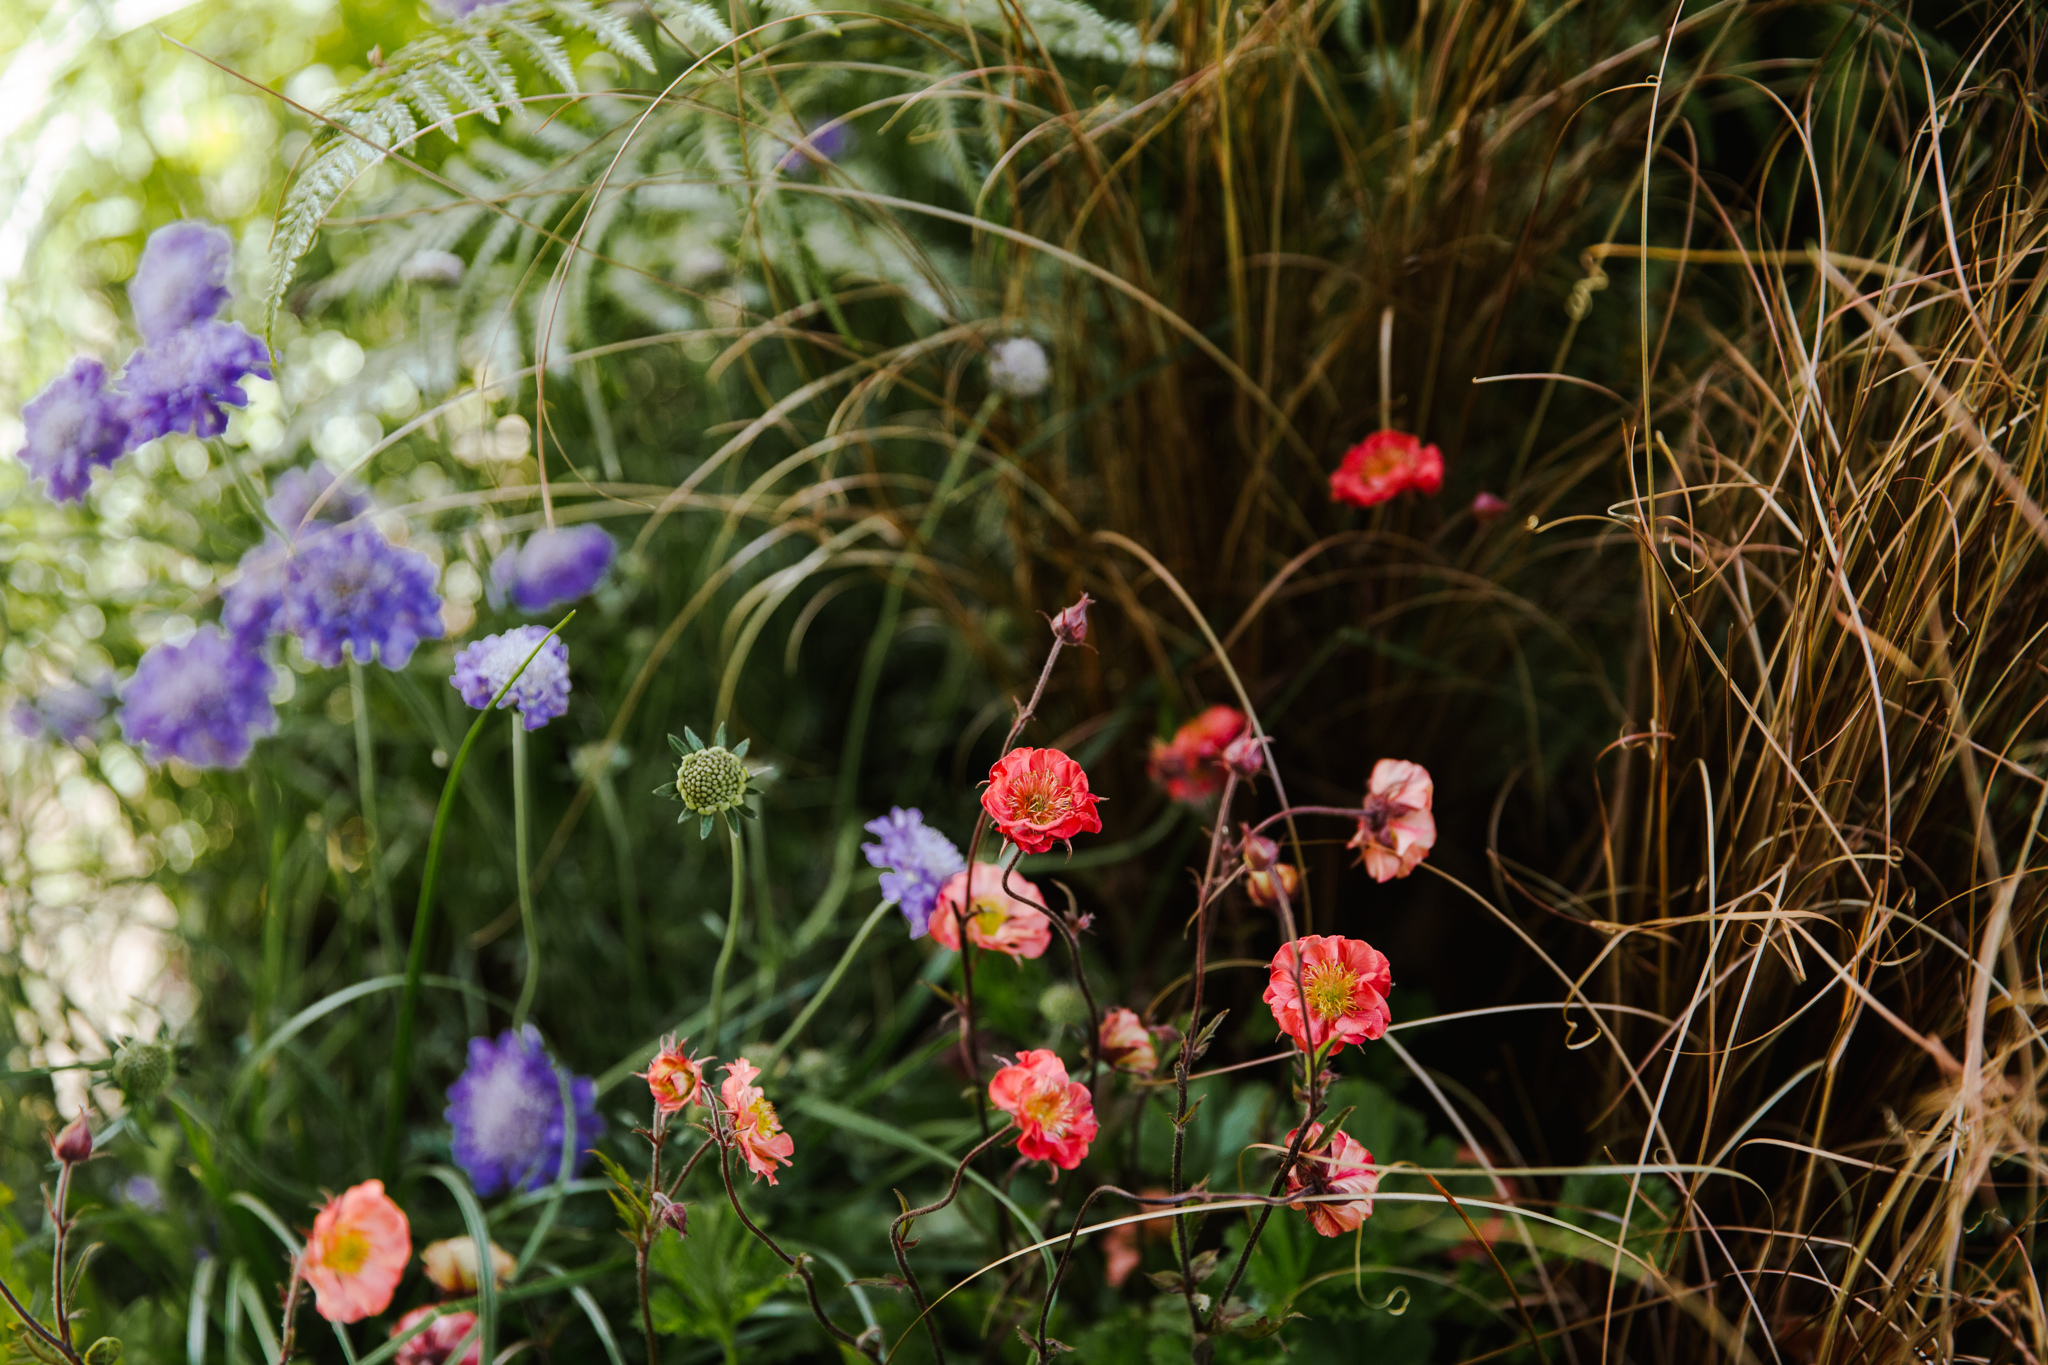 LAND-Chelsea-flower-show_Joanne-Crawford-8040.JPG